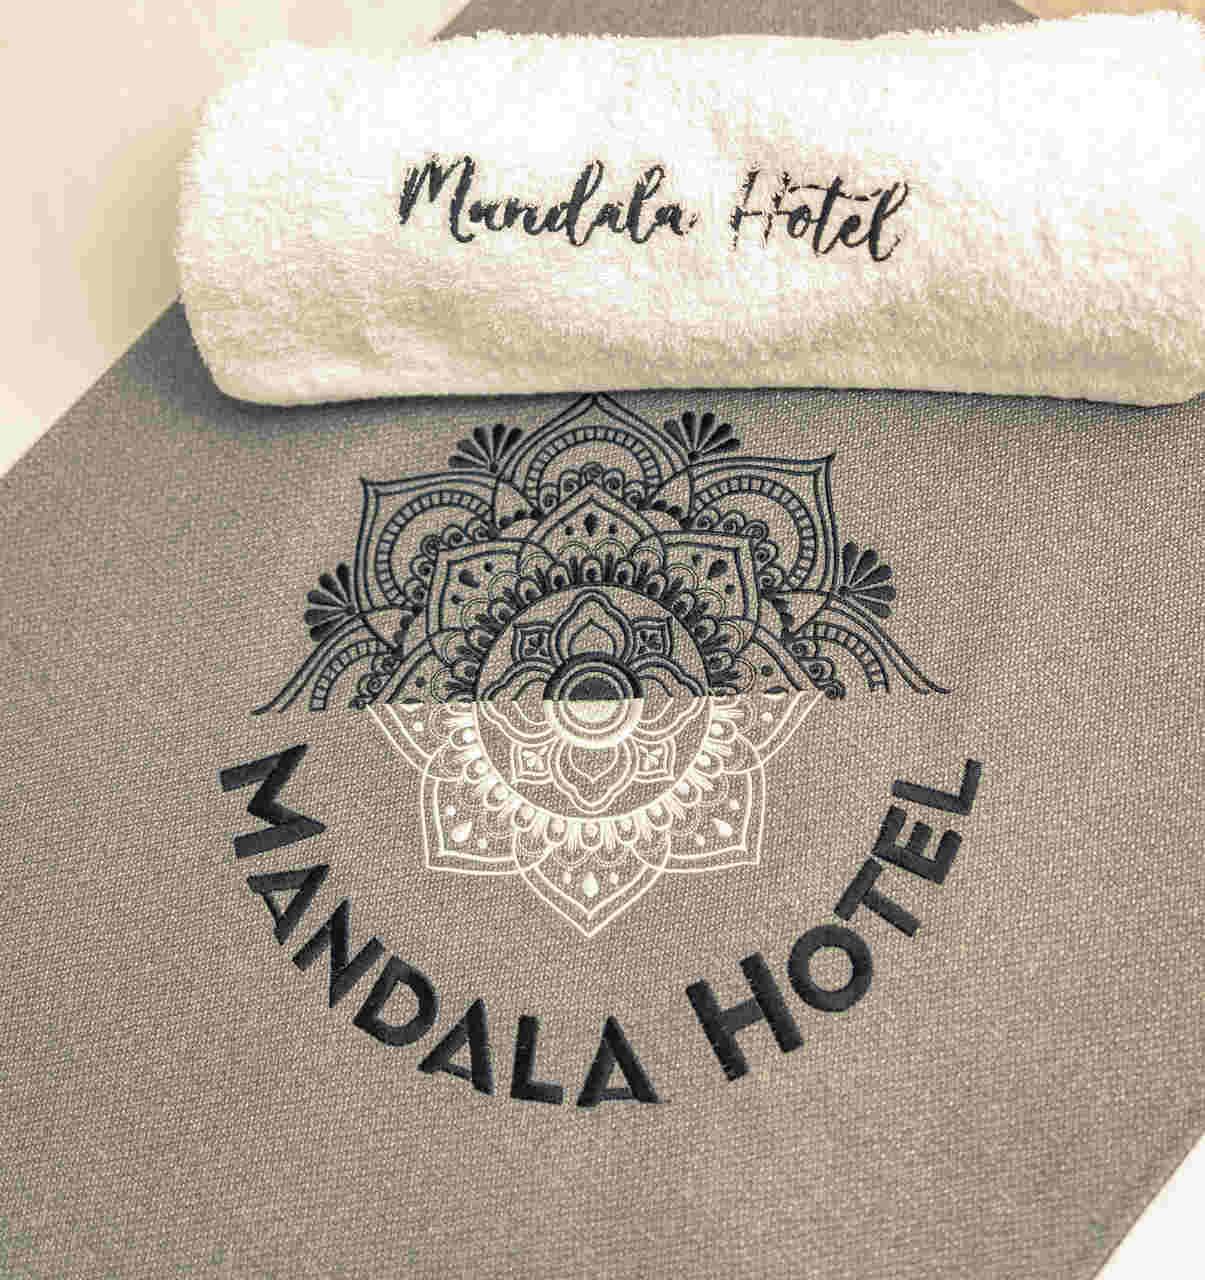 Hotel Mandala Belén en Comuna 16 - Belén : MotelNow